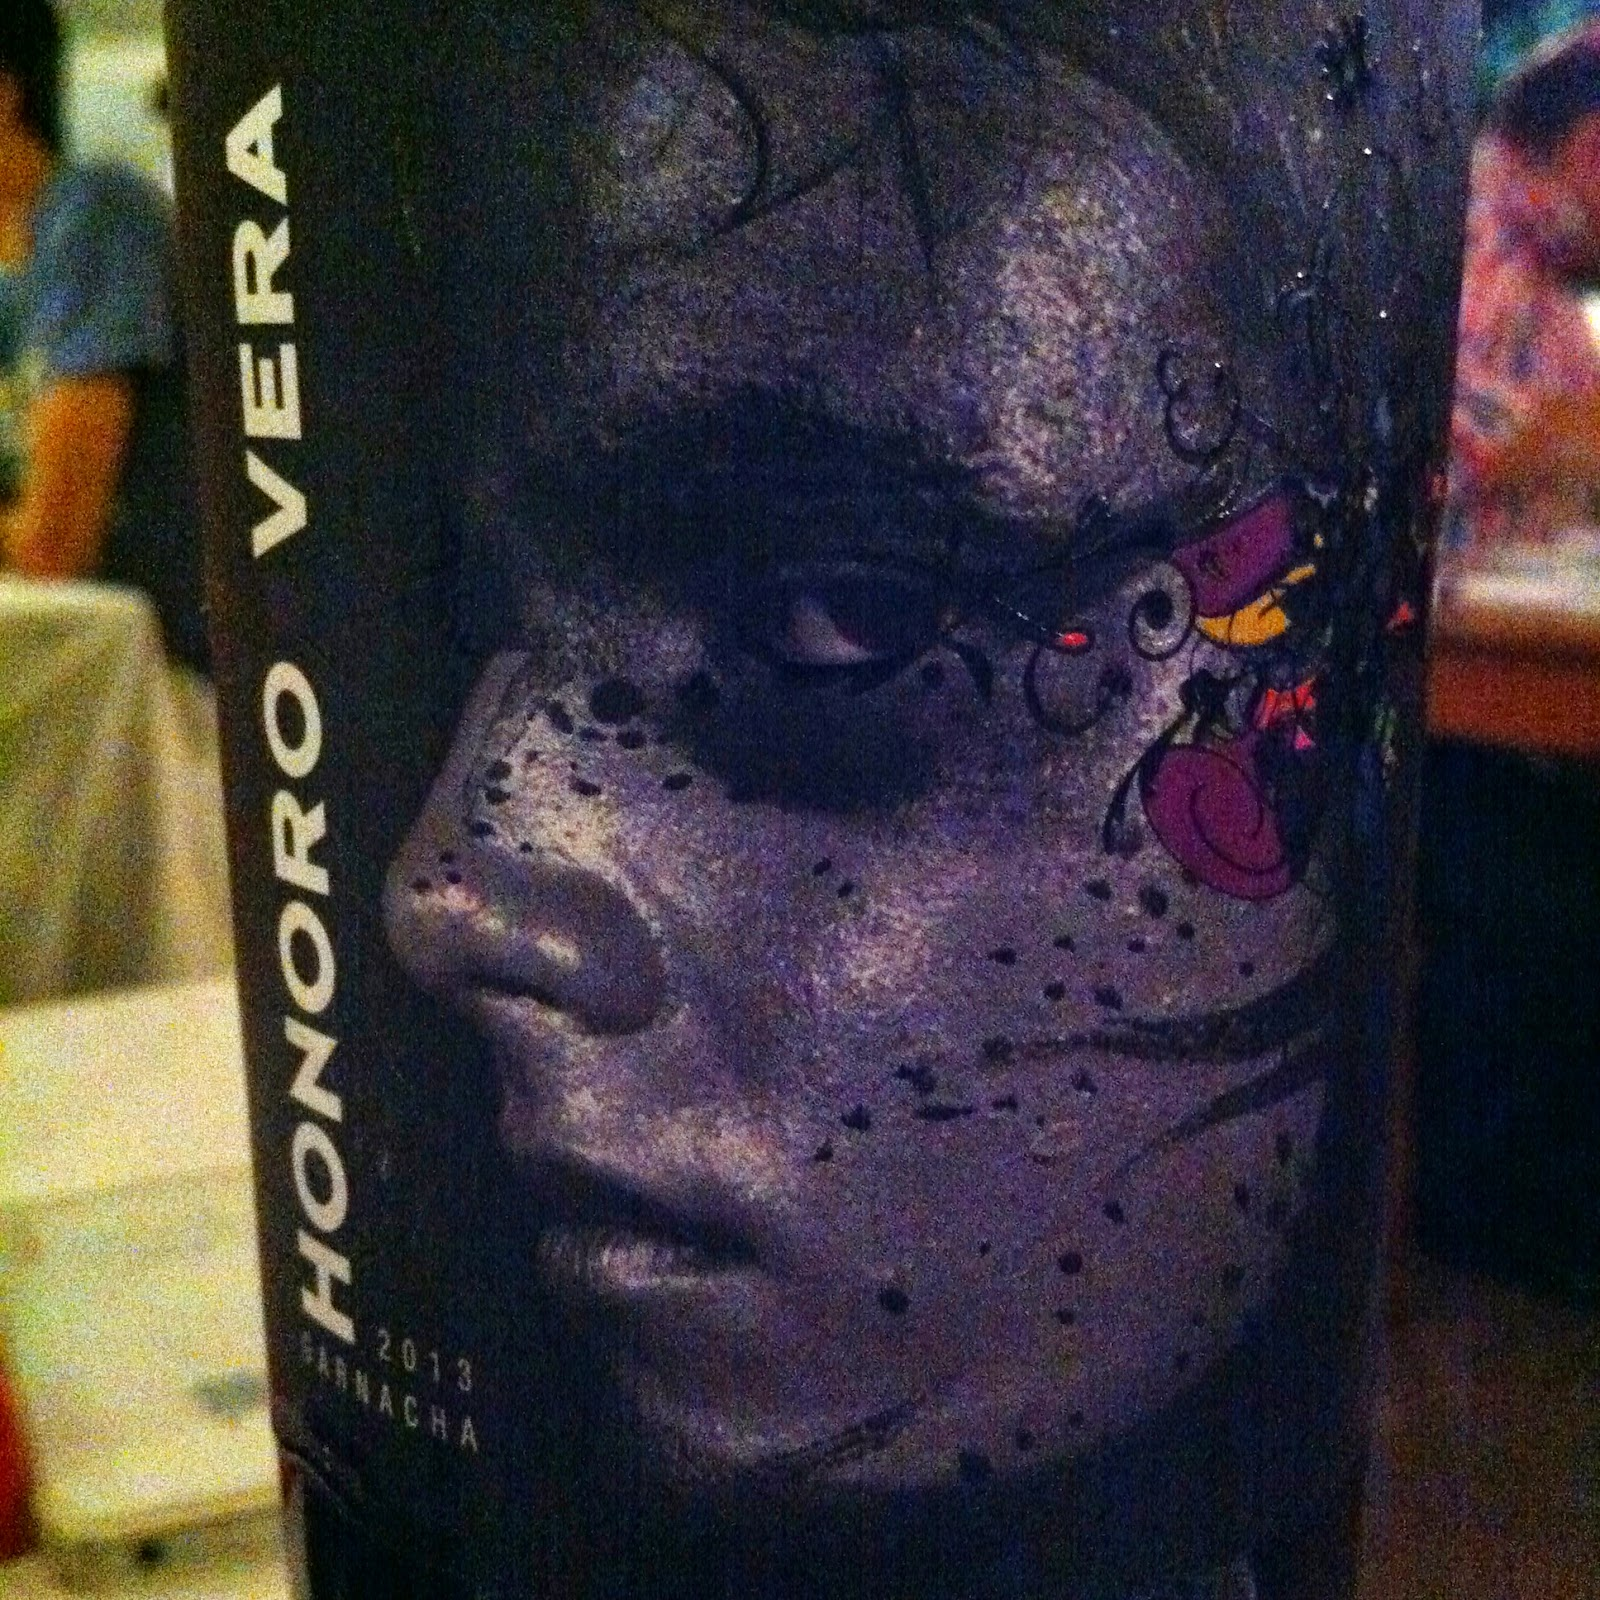 honorio-vera-2013-garnacha-calatayud-tinto